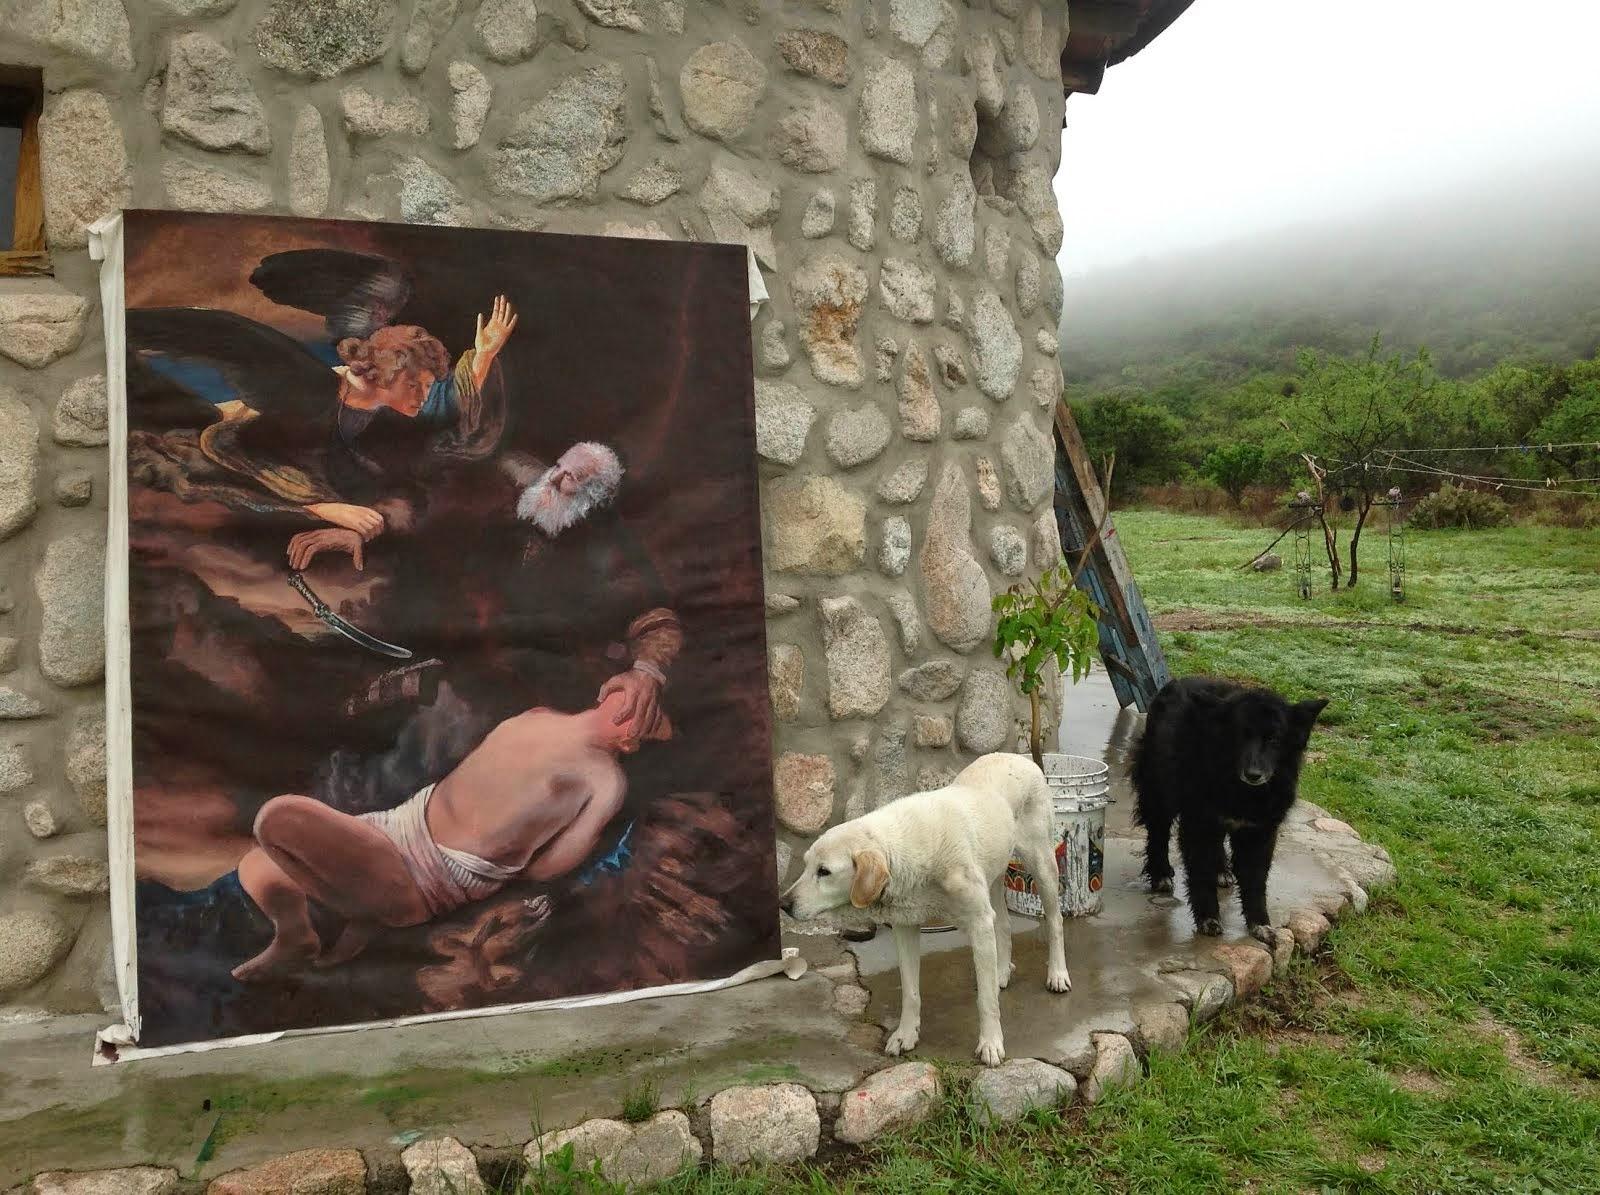 El sacrificio de abraham -rembrandt- ( oil copy )